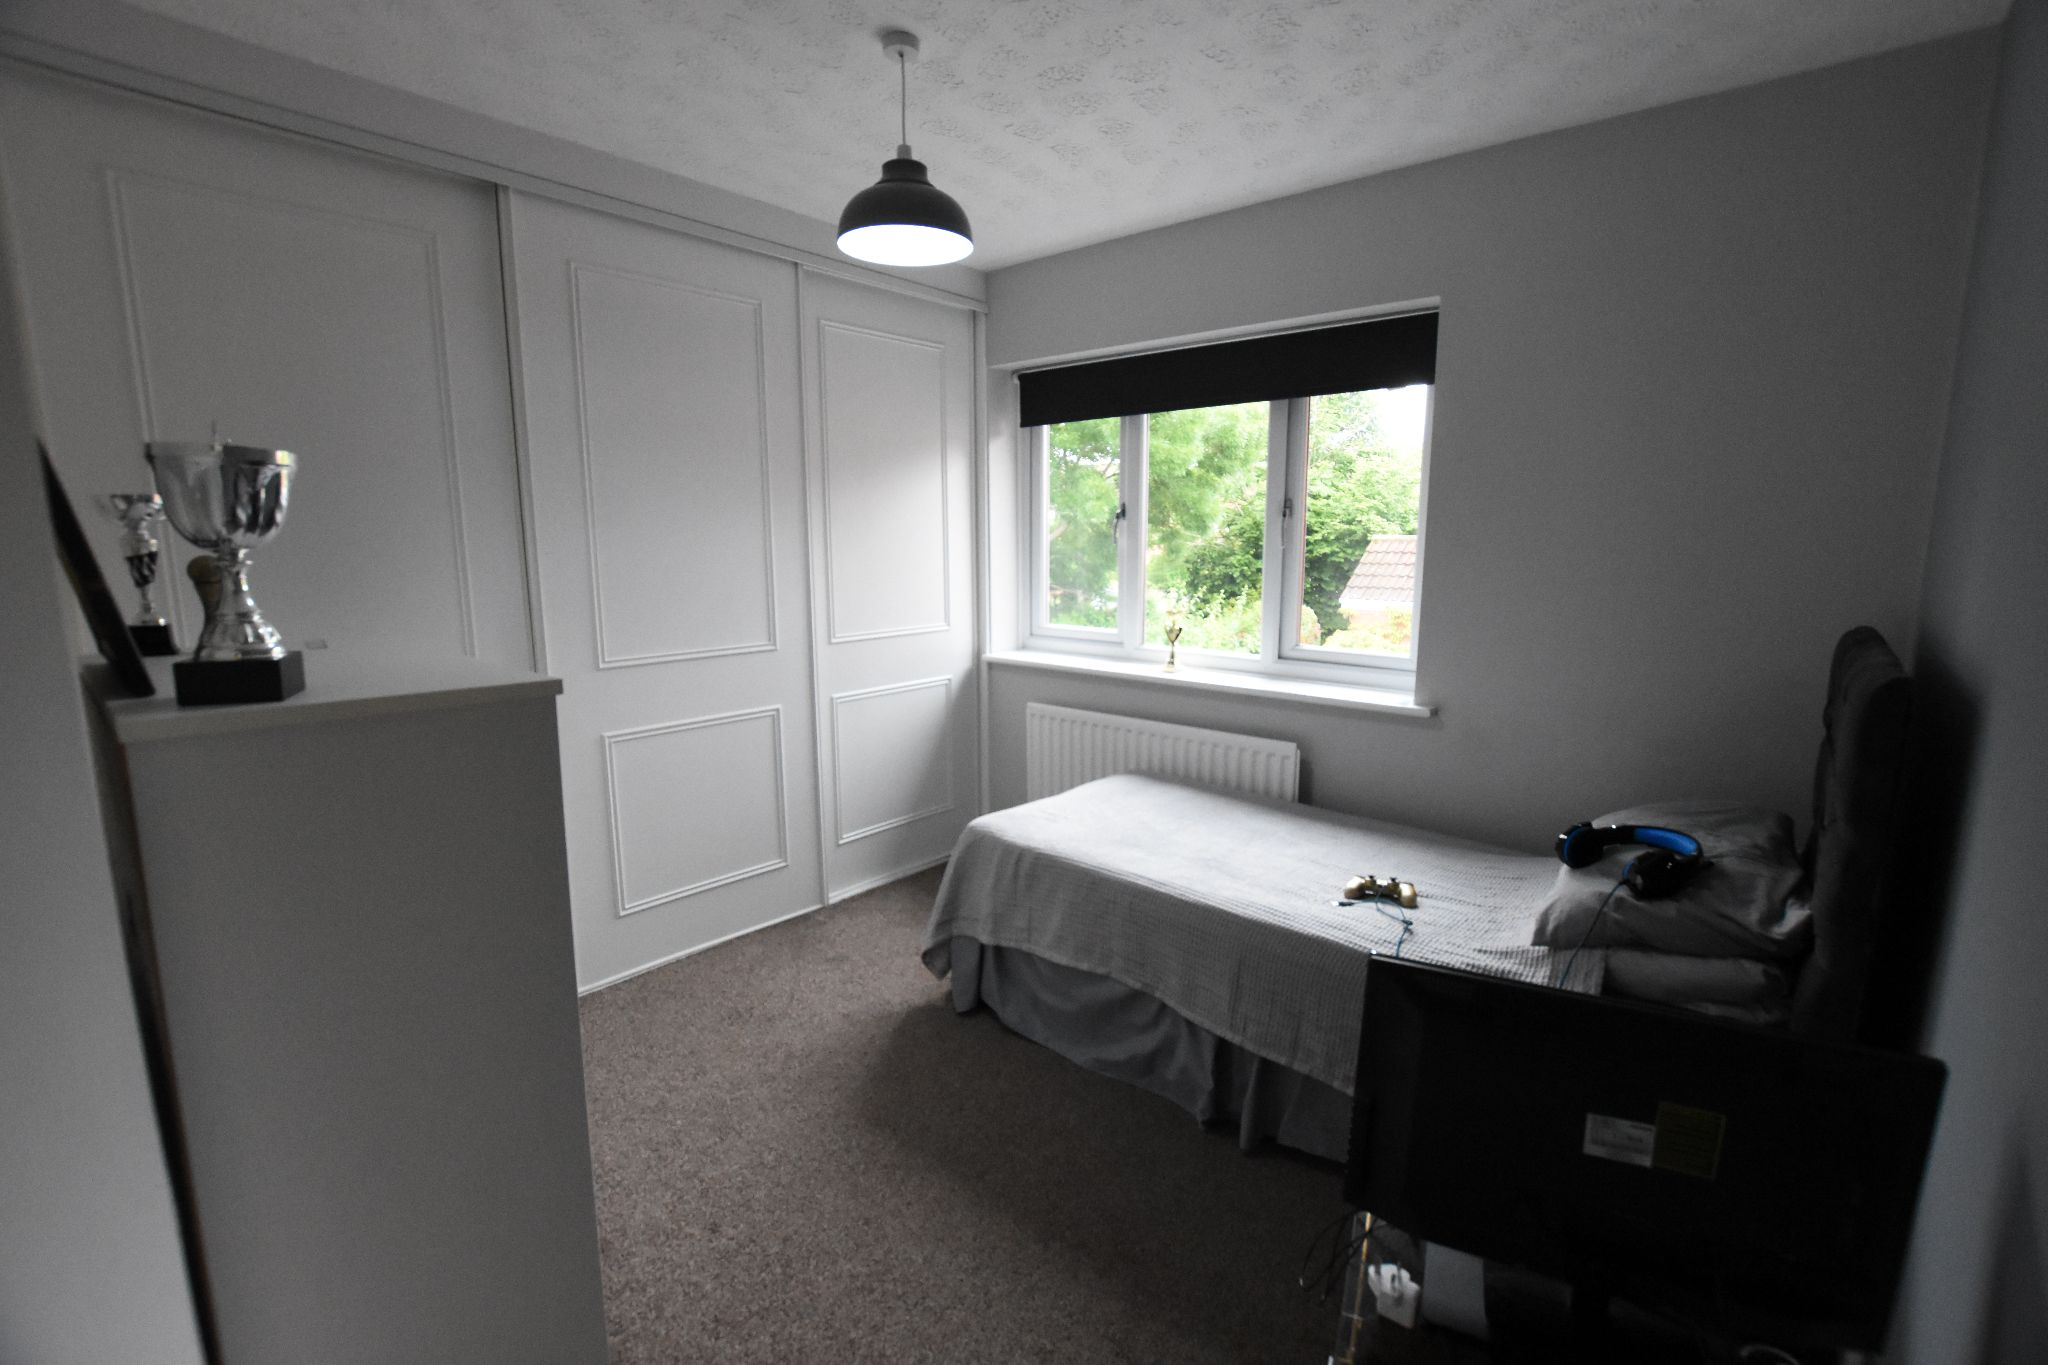 3 bedroom detached house Sold STC in Preston - Bedroom 2